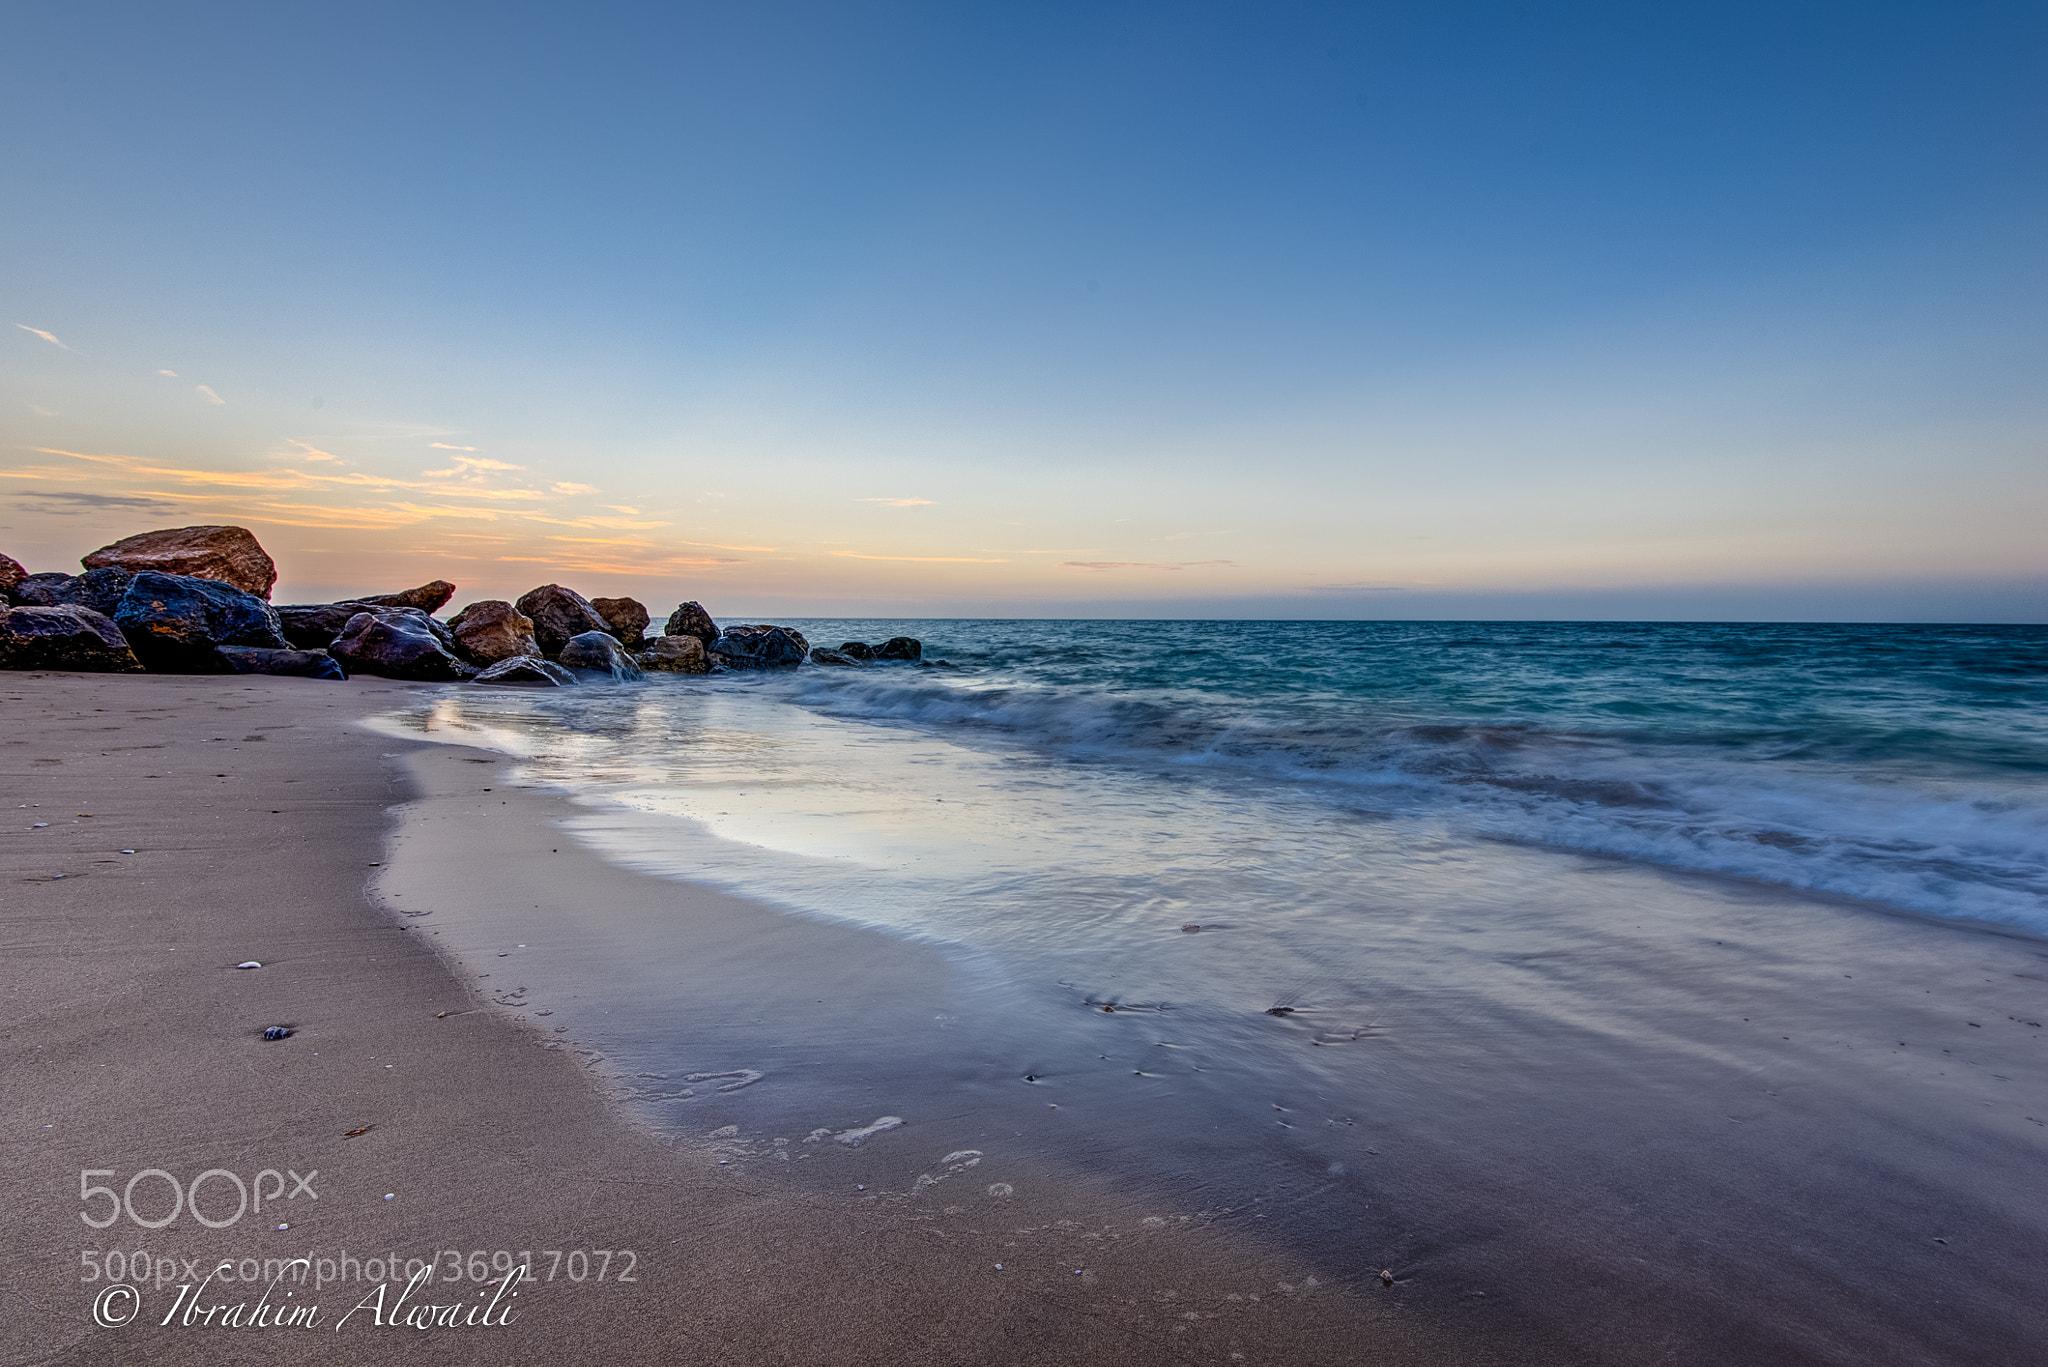 Photograph Sea and Rocks by Ibrahim AlWaili on 500px